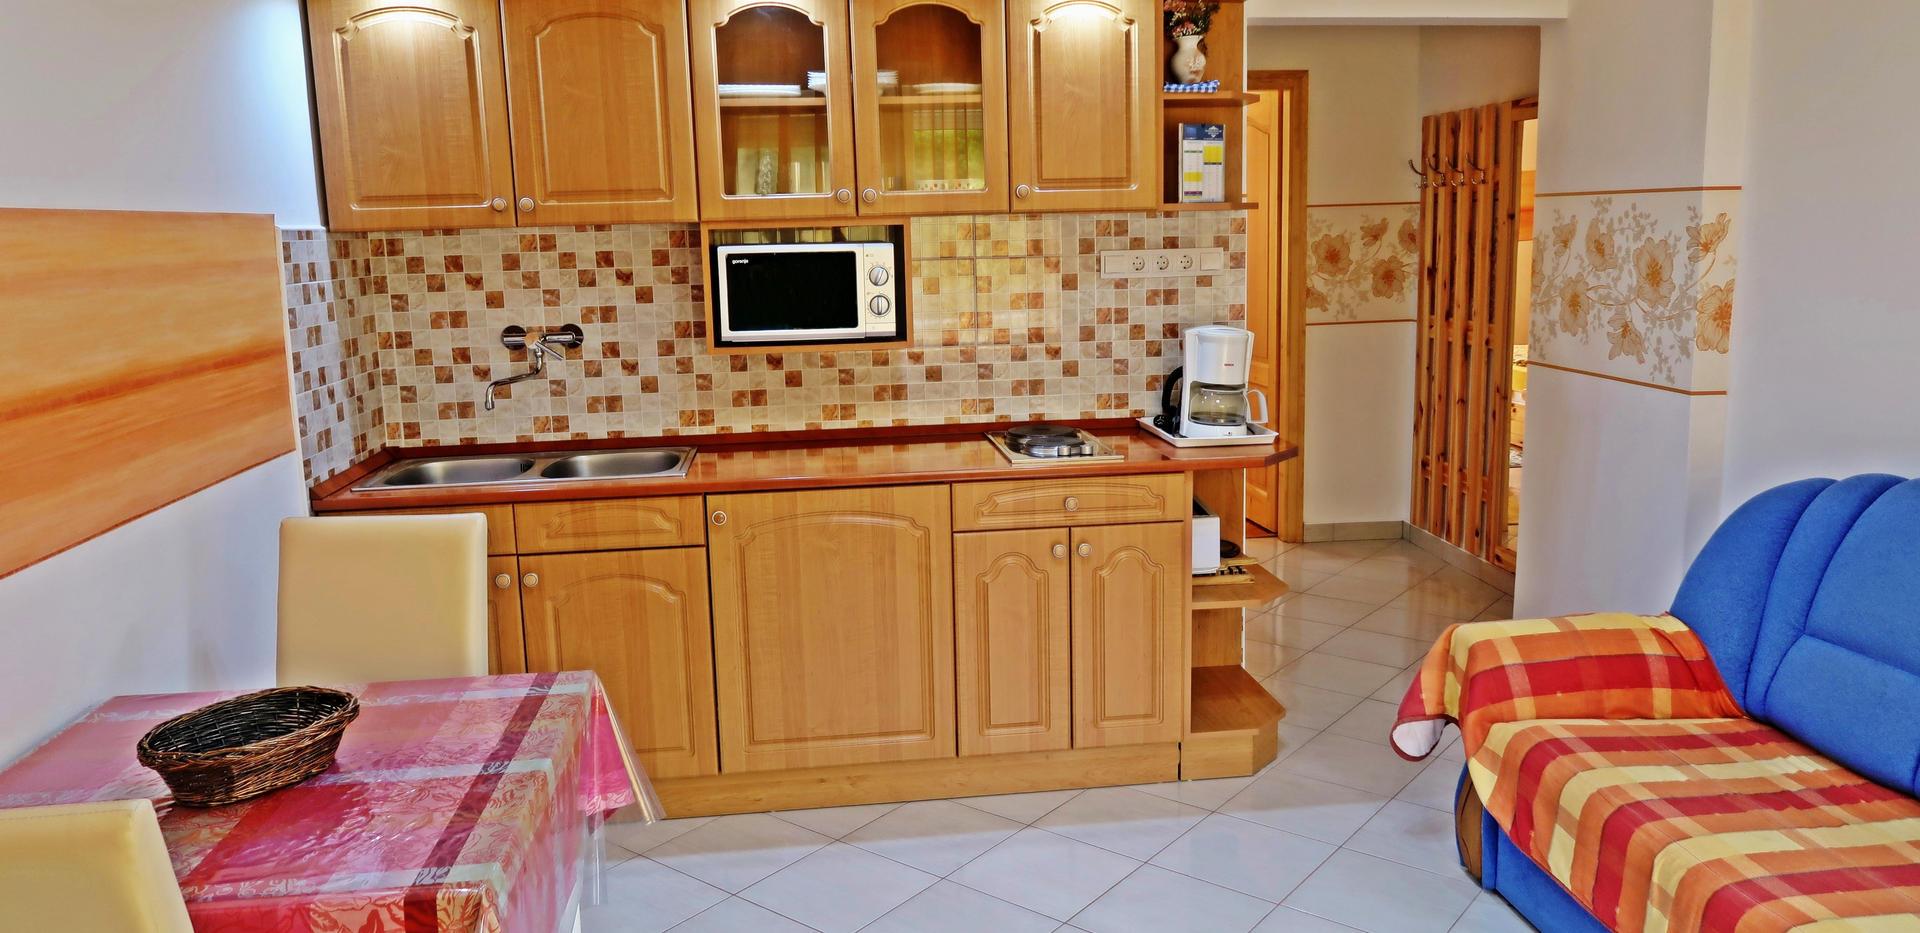 Zalakaros_4-es Ház_4-es apartman